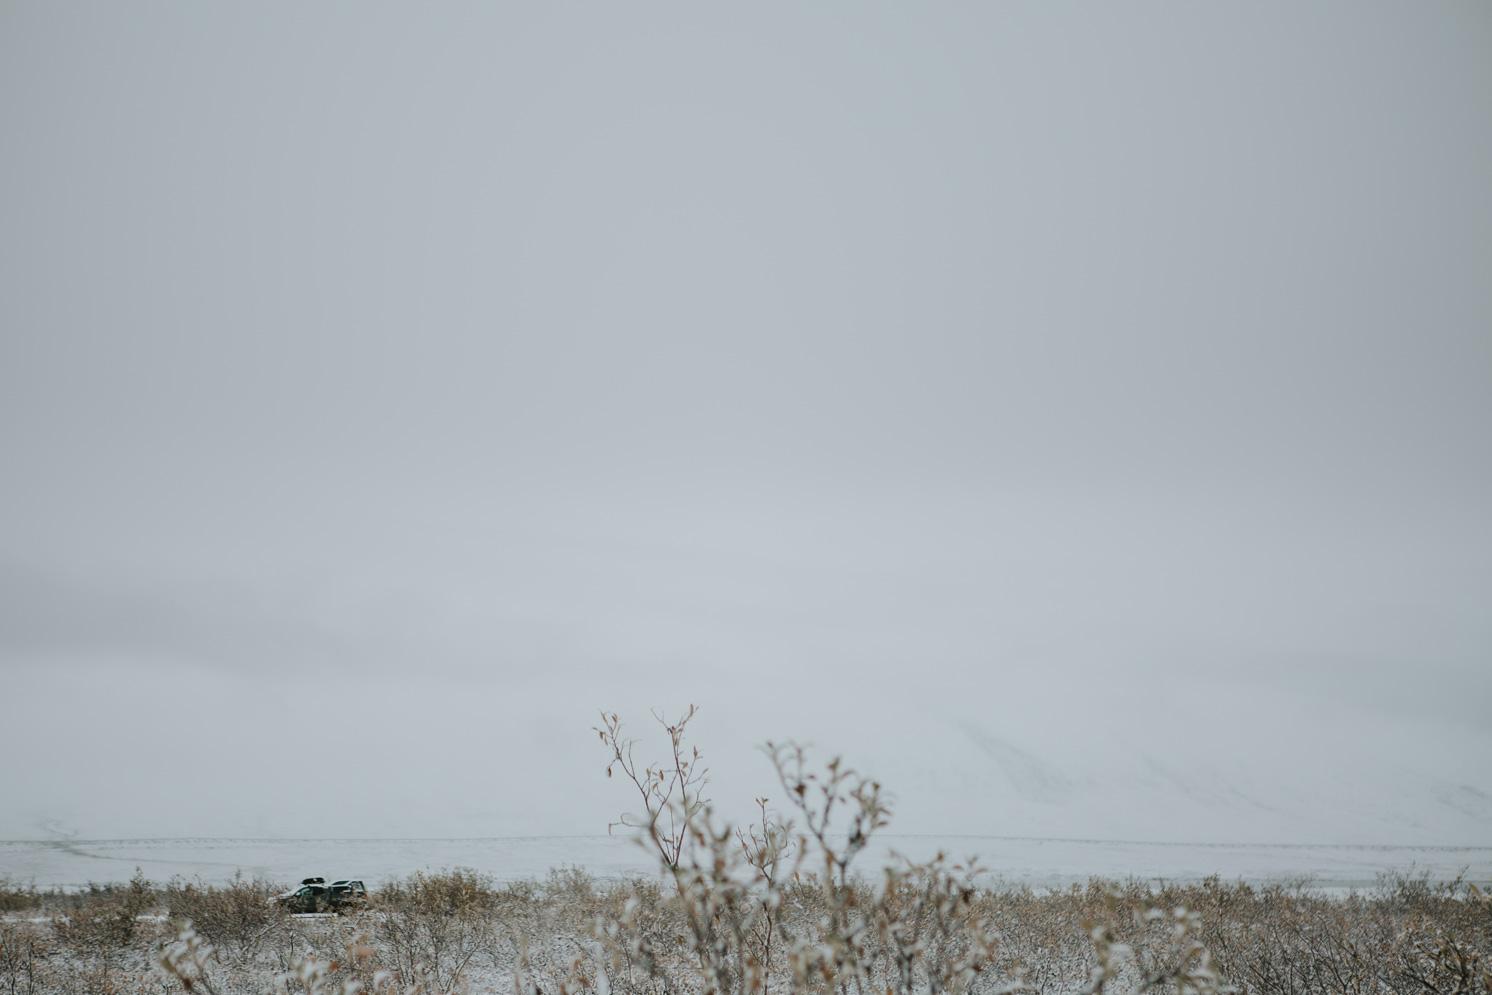 CindyGiovagnoli_Alaska_DaltonHighway_GalbraithLake_NorthSlope_GatesOfTheArctic_ArcticCircle_ArcticNationalWildlifeRefuge_Moose_DallSheep_snow_winter_BrooksRange-020.jpg